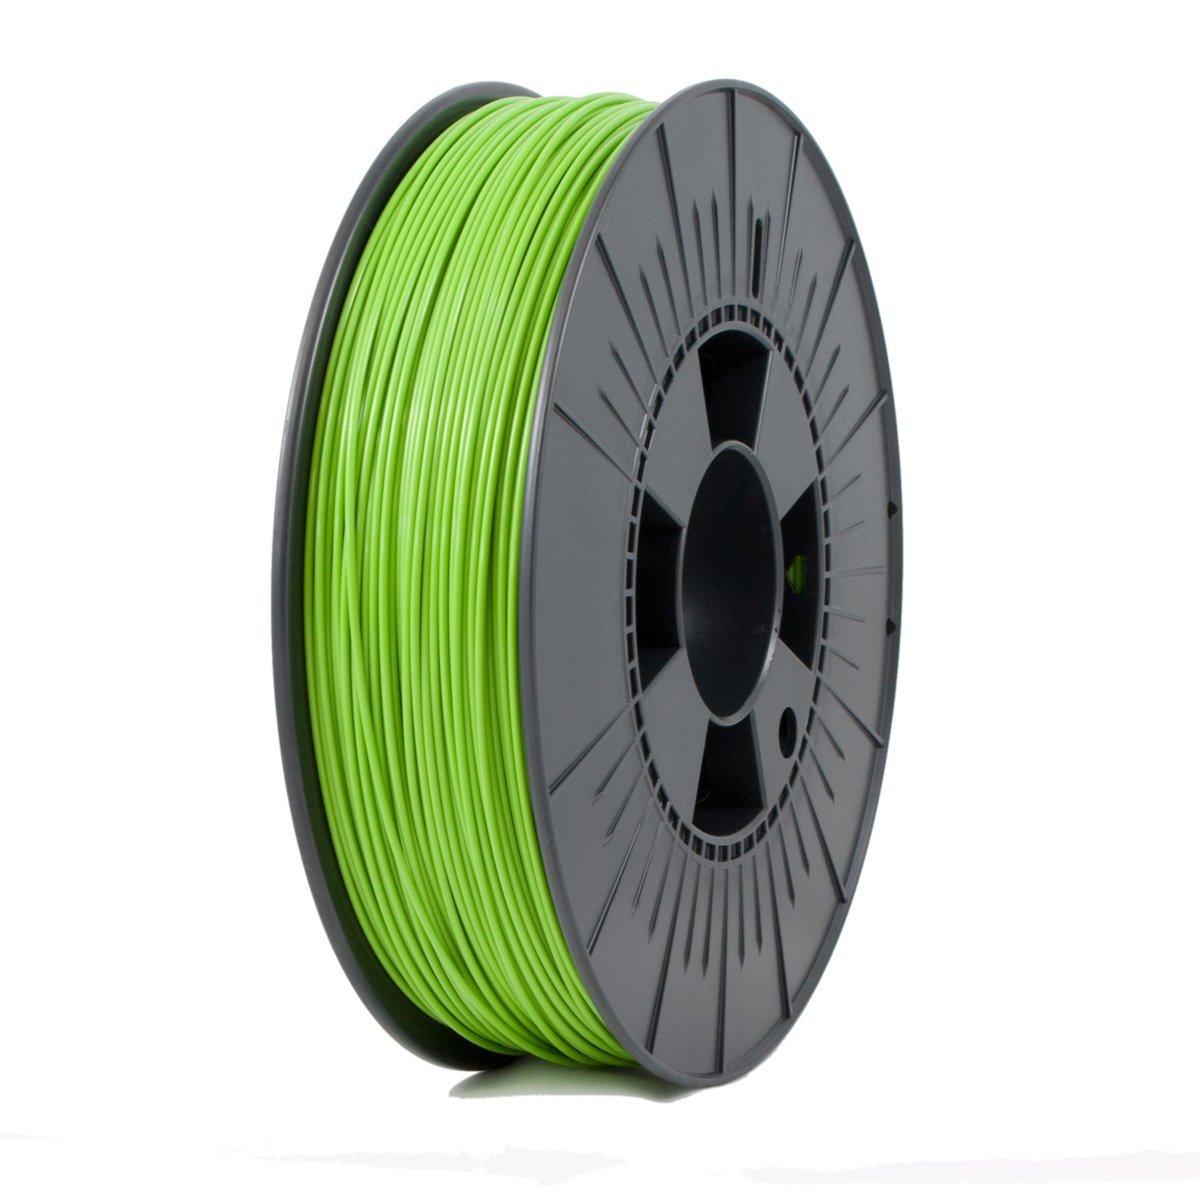 Ice Filaments  Gracious Green PLA 1.75 mm